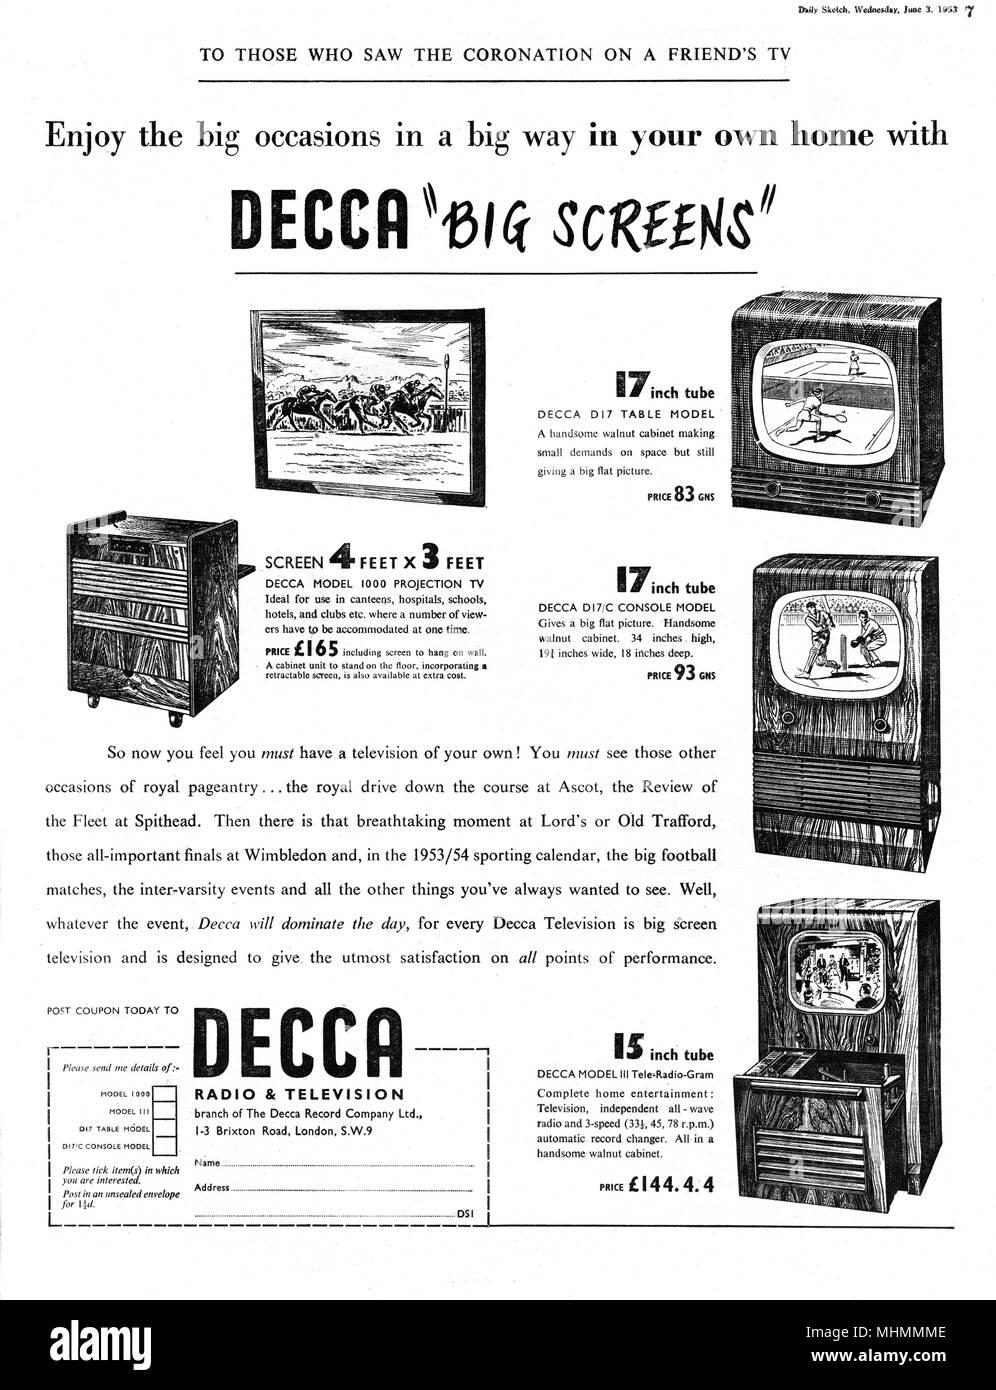 1953 Coronation Stock Photos 1953 Coronation Stock Images